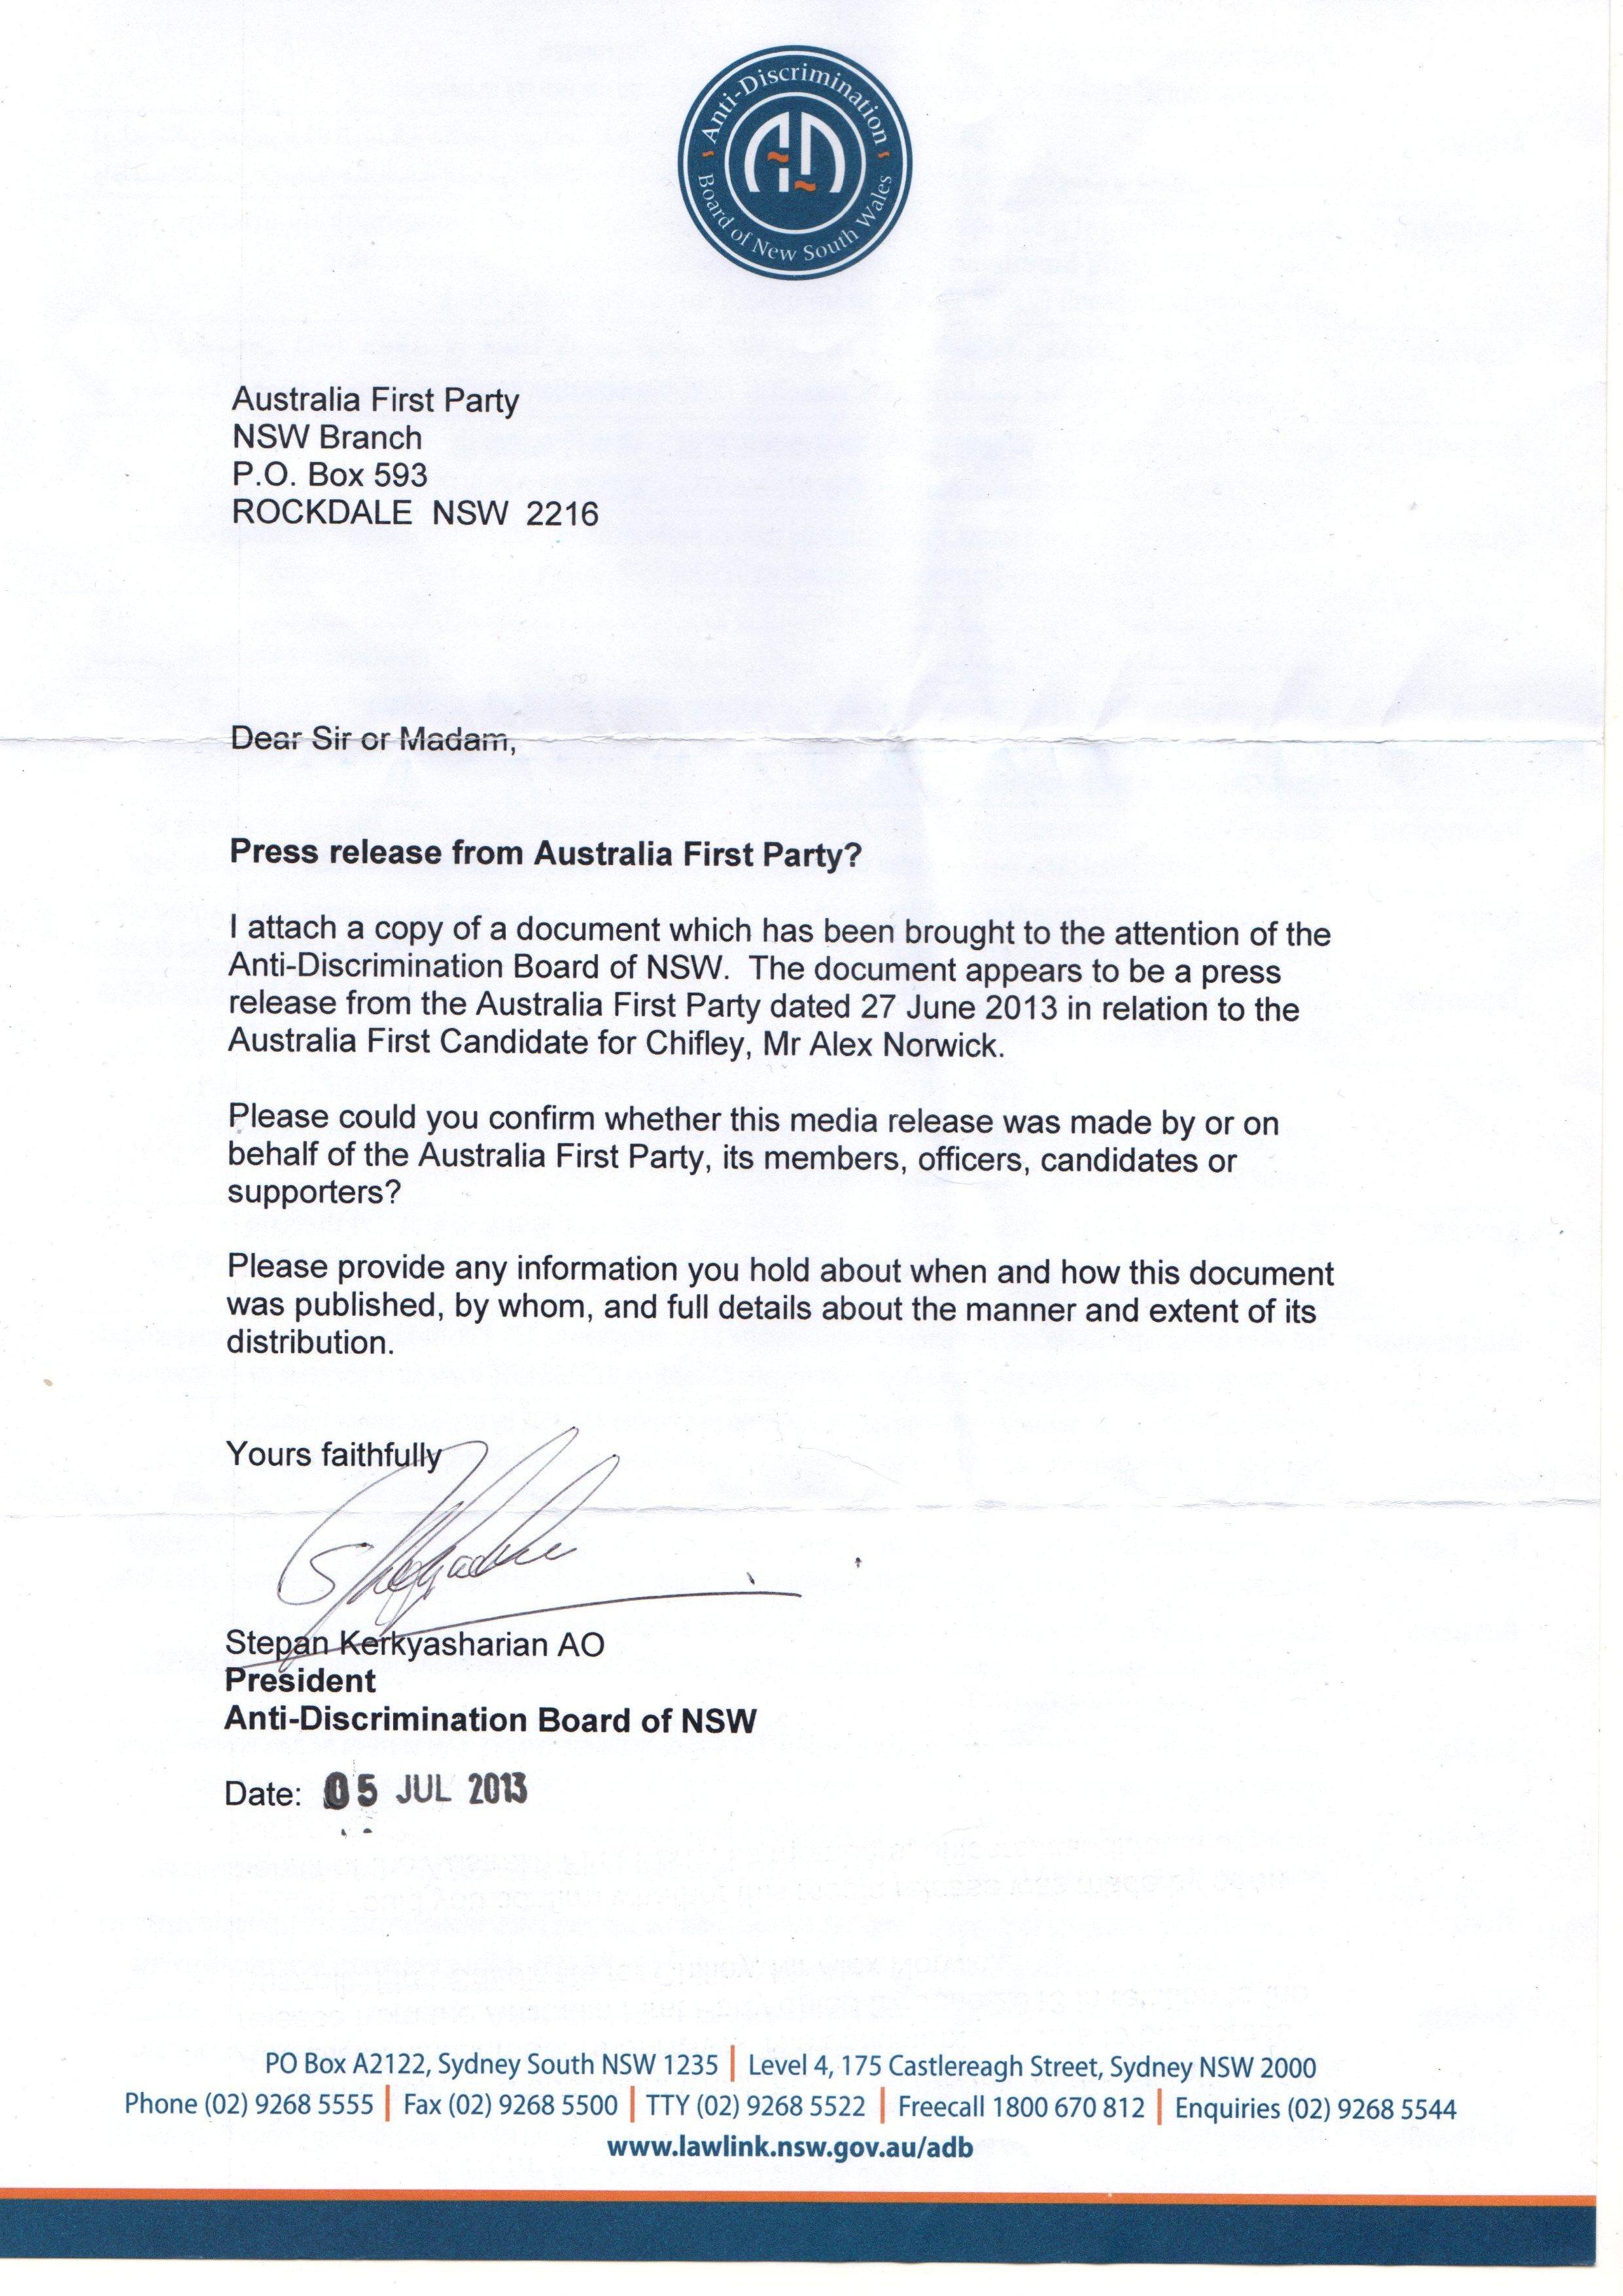 Stepan Kerkasharian Intimidation Letter